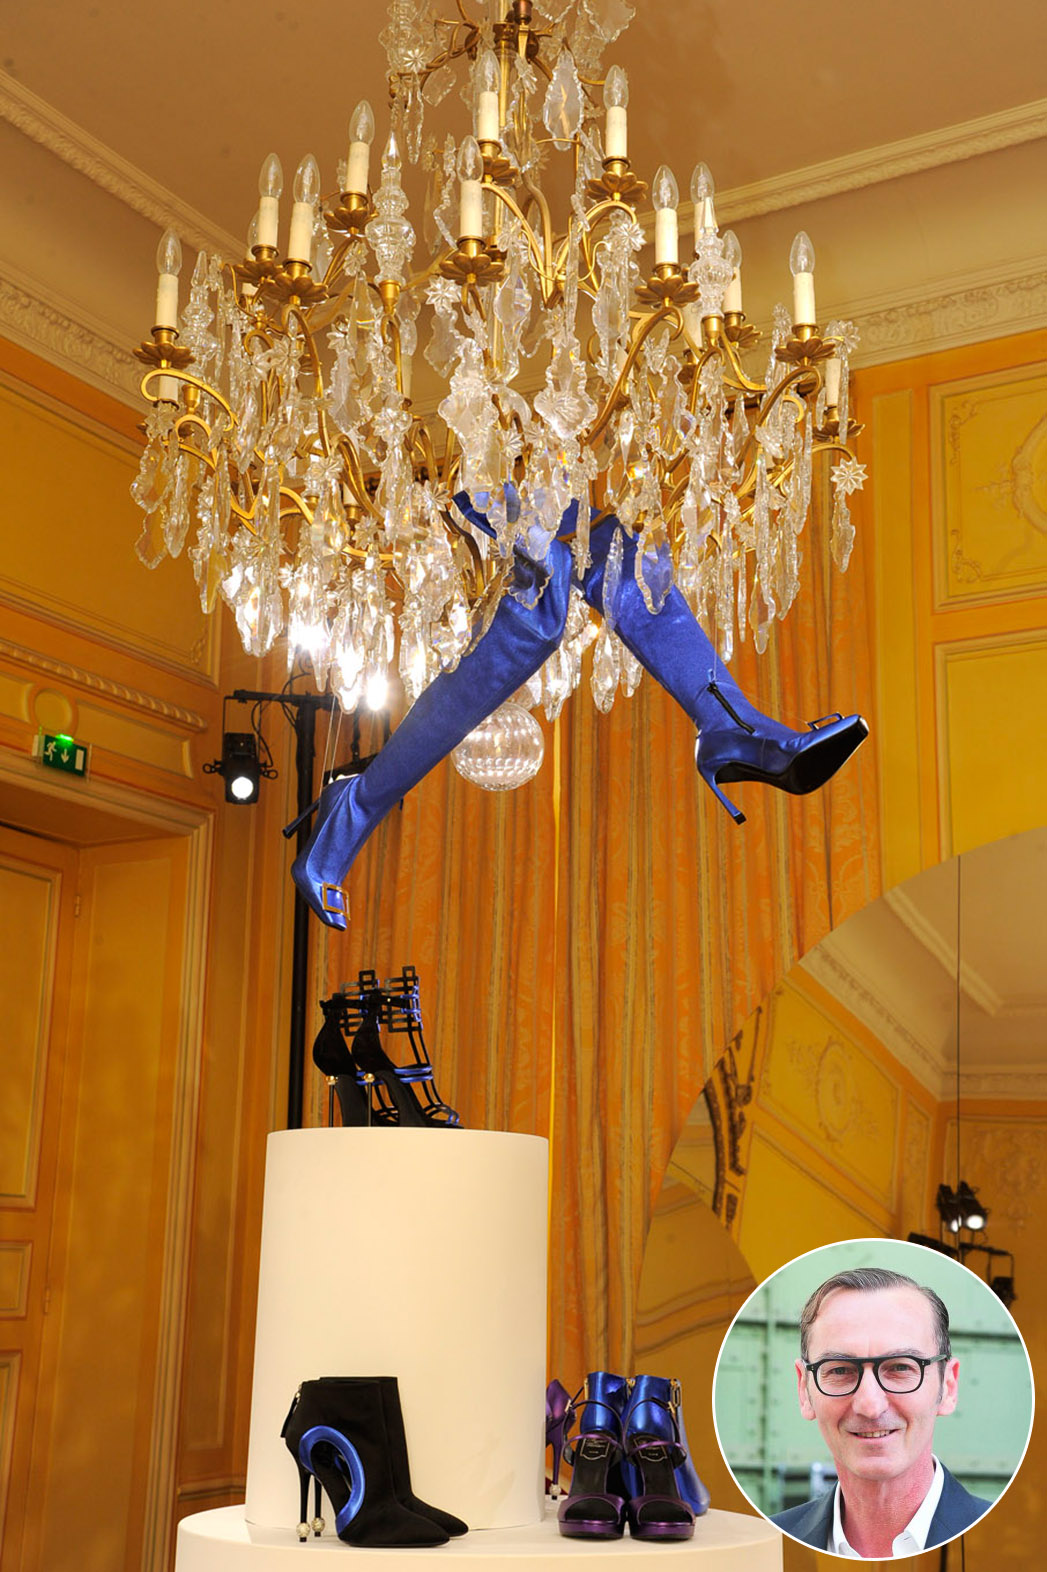 Chandelier Shoes Inset - P 2015